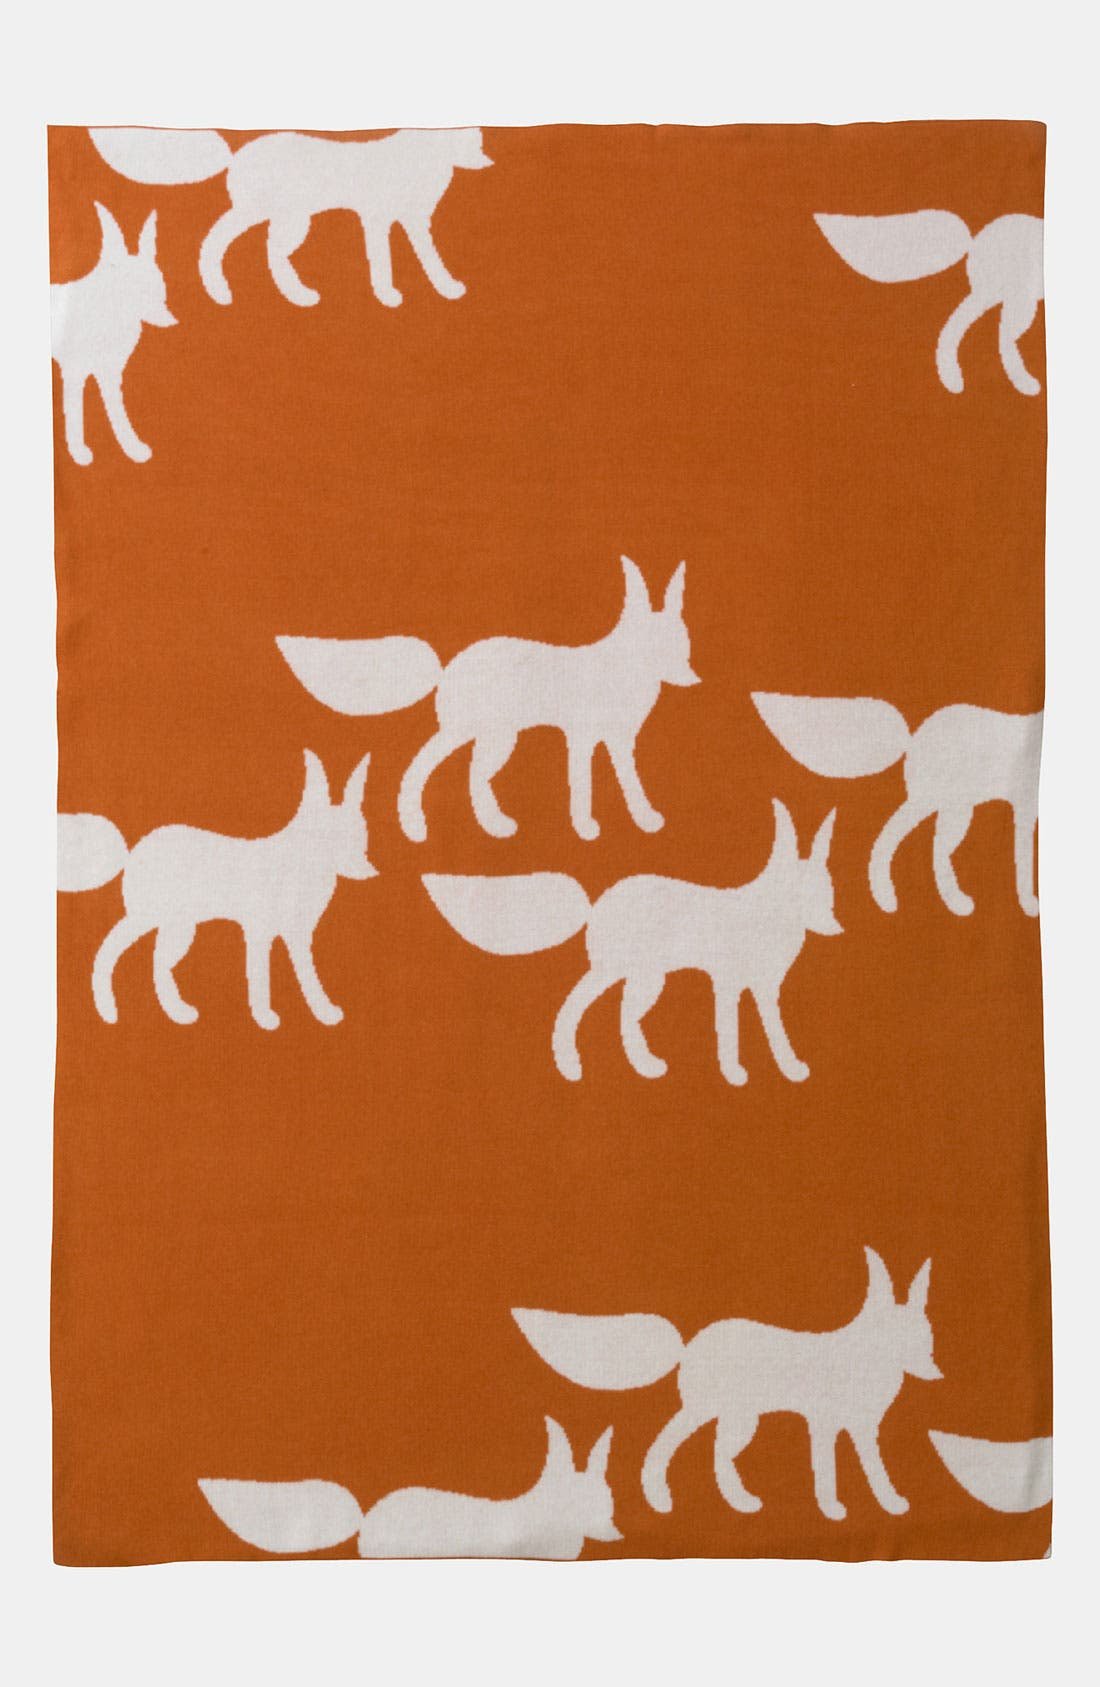 Alternate Image 1 Selected - DwellStudio Graphic Knit Blanket